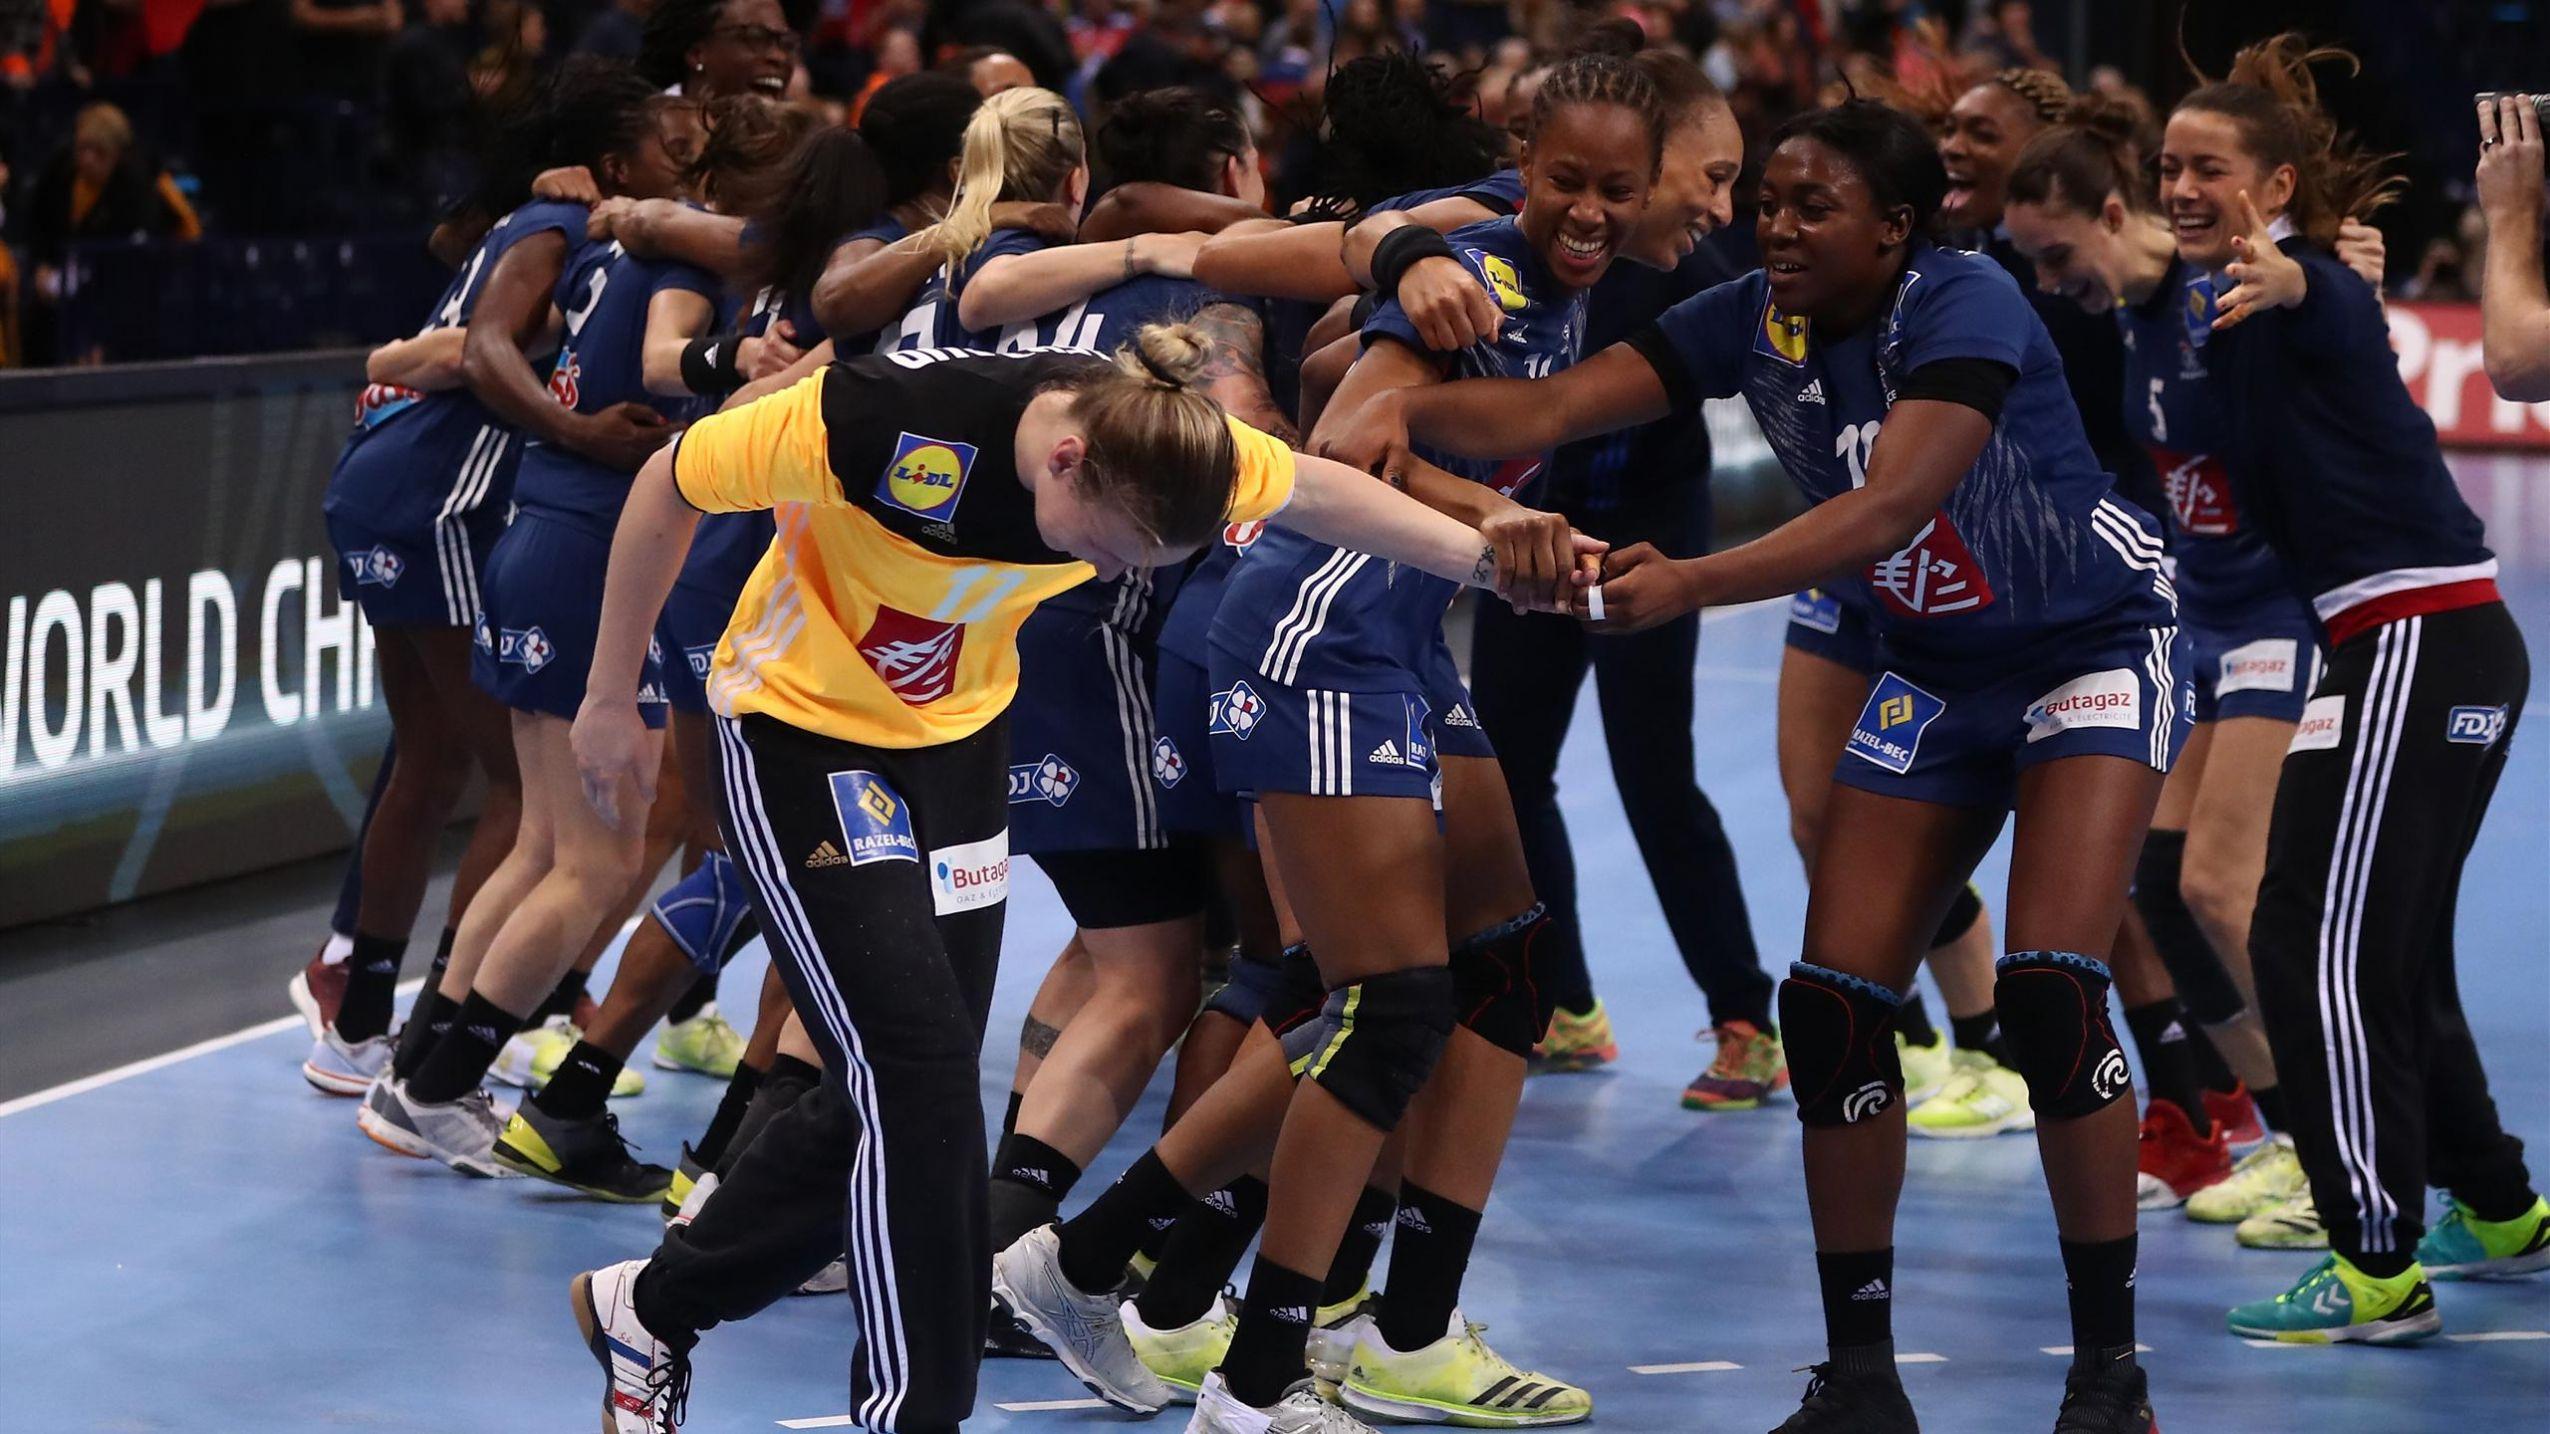 Mondial handball la france f en finale face la norv ge - Diffusion coupe du monde handball ...